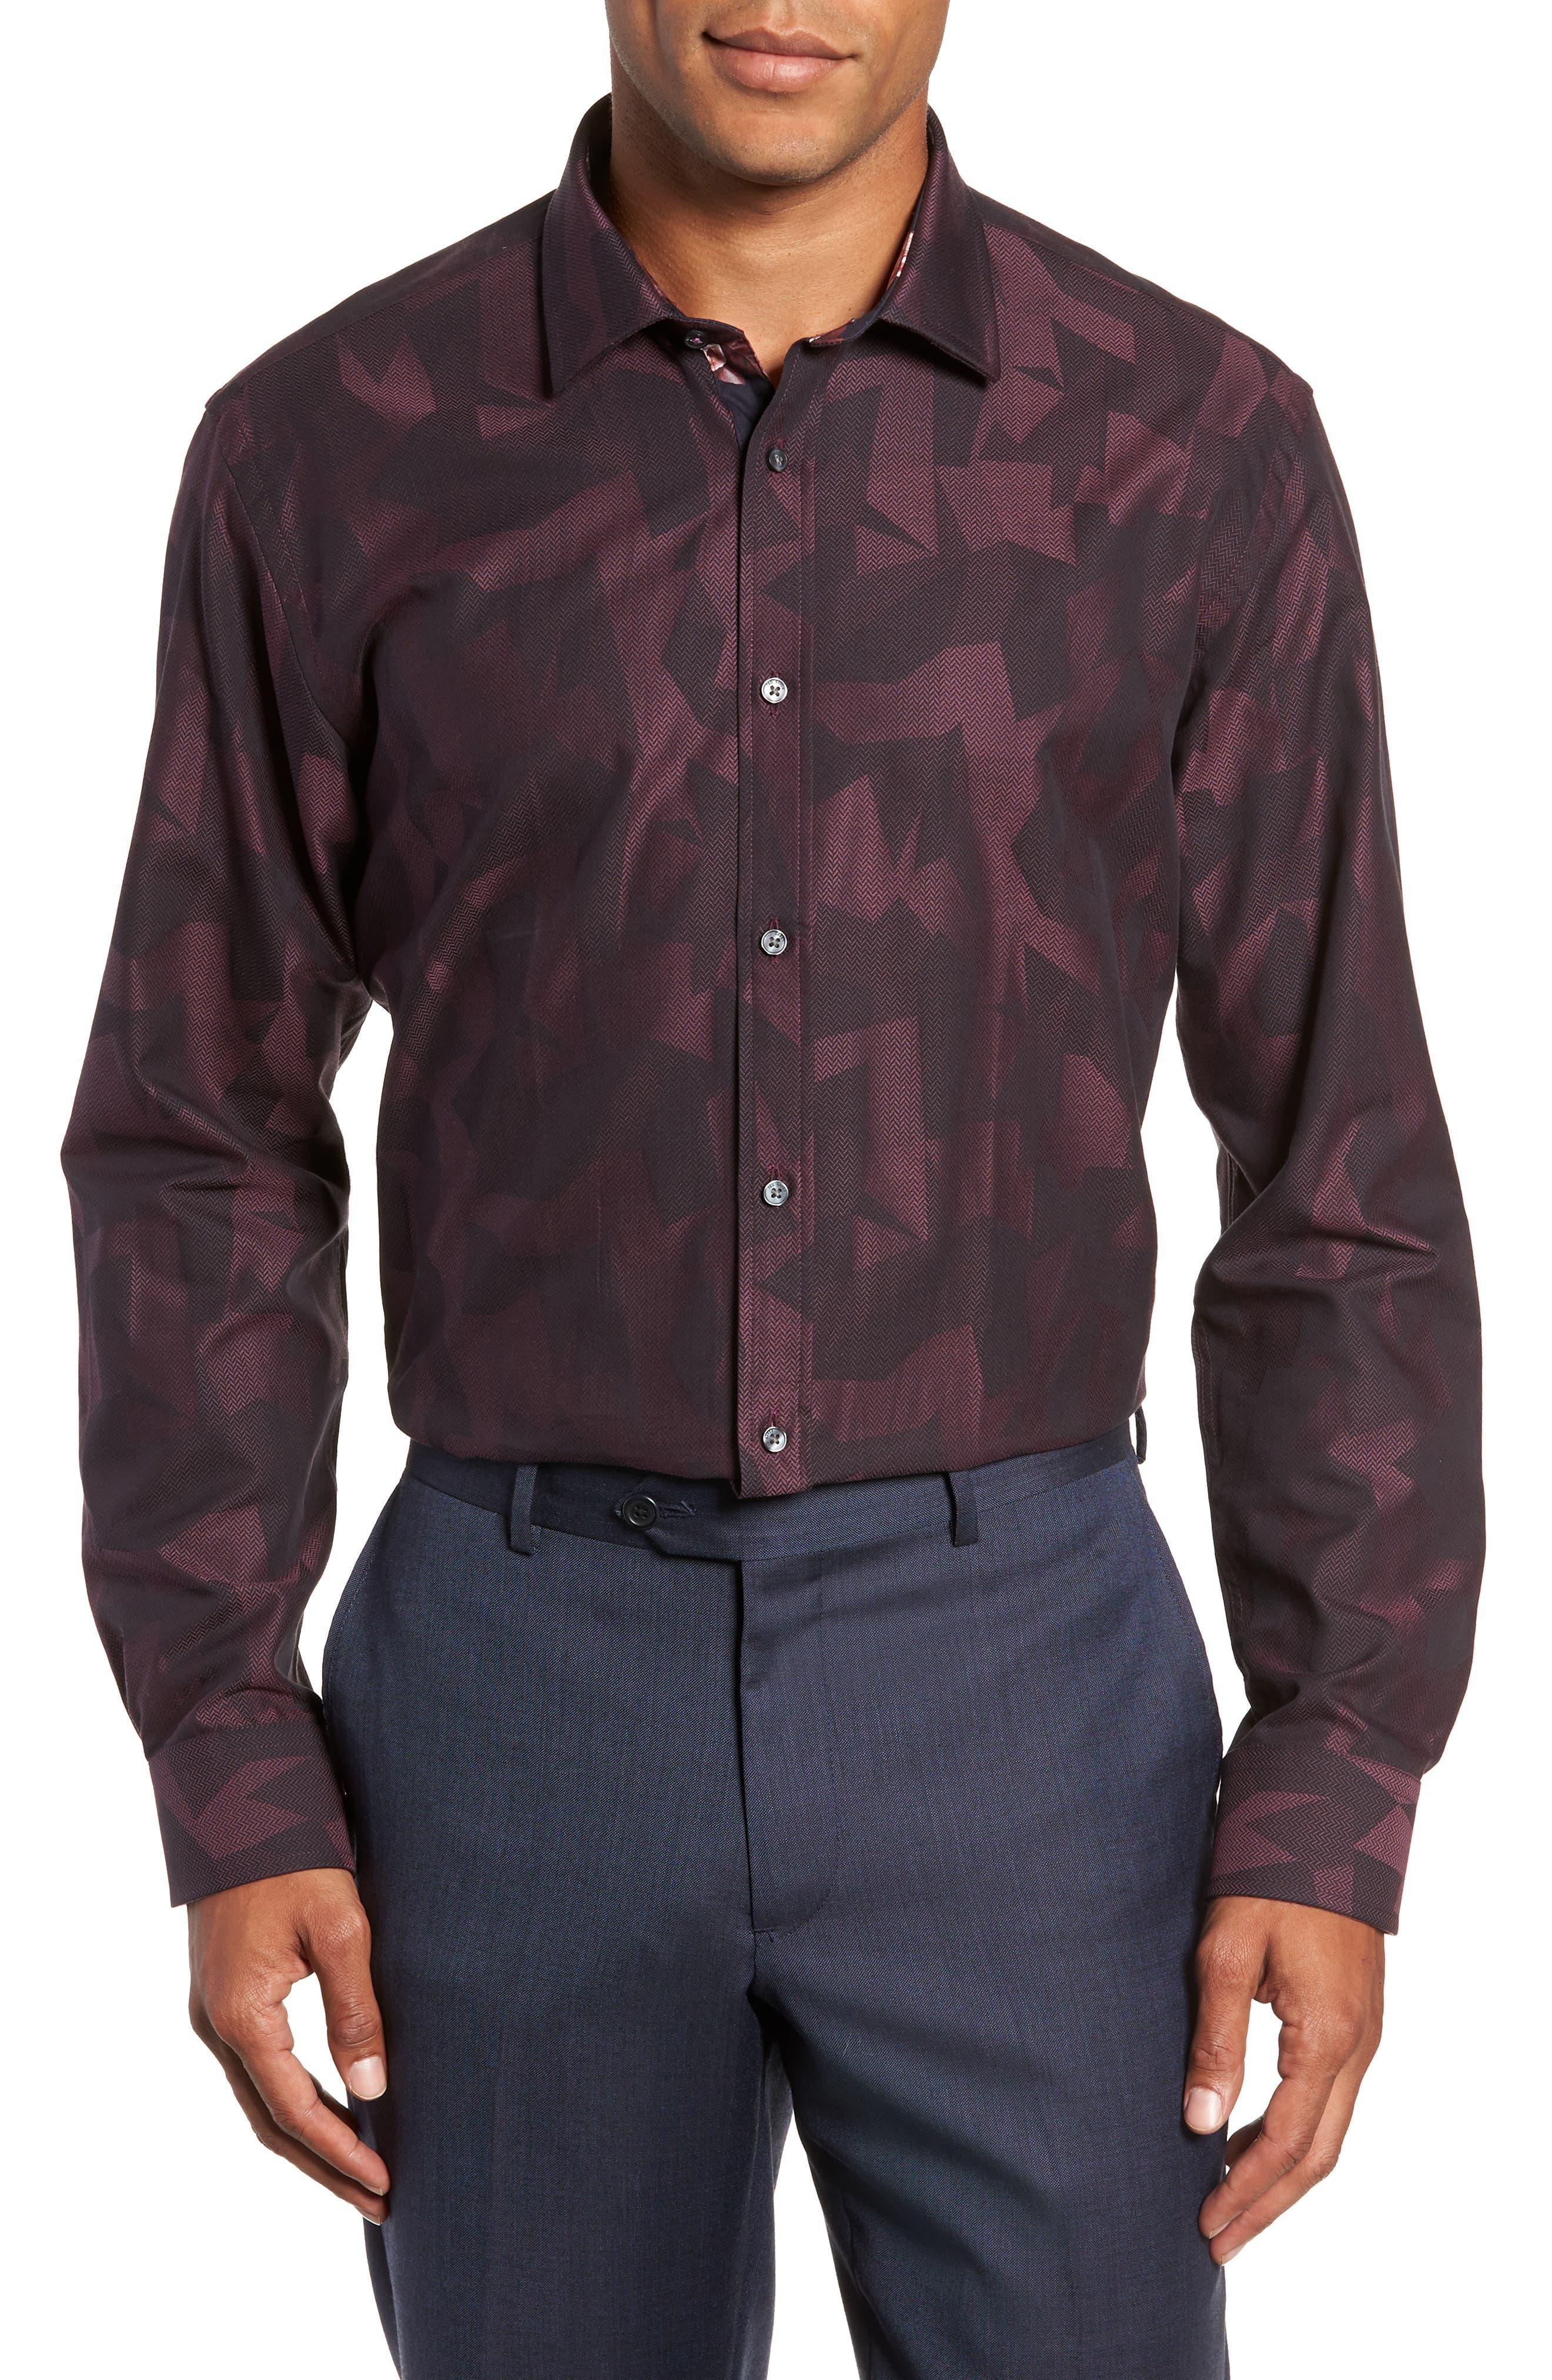 Slissum Slim Fit Print Dress Shirt,                         Main,                         color, DARK RED